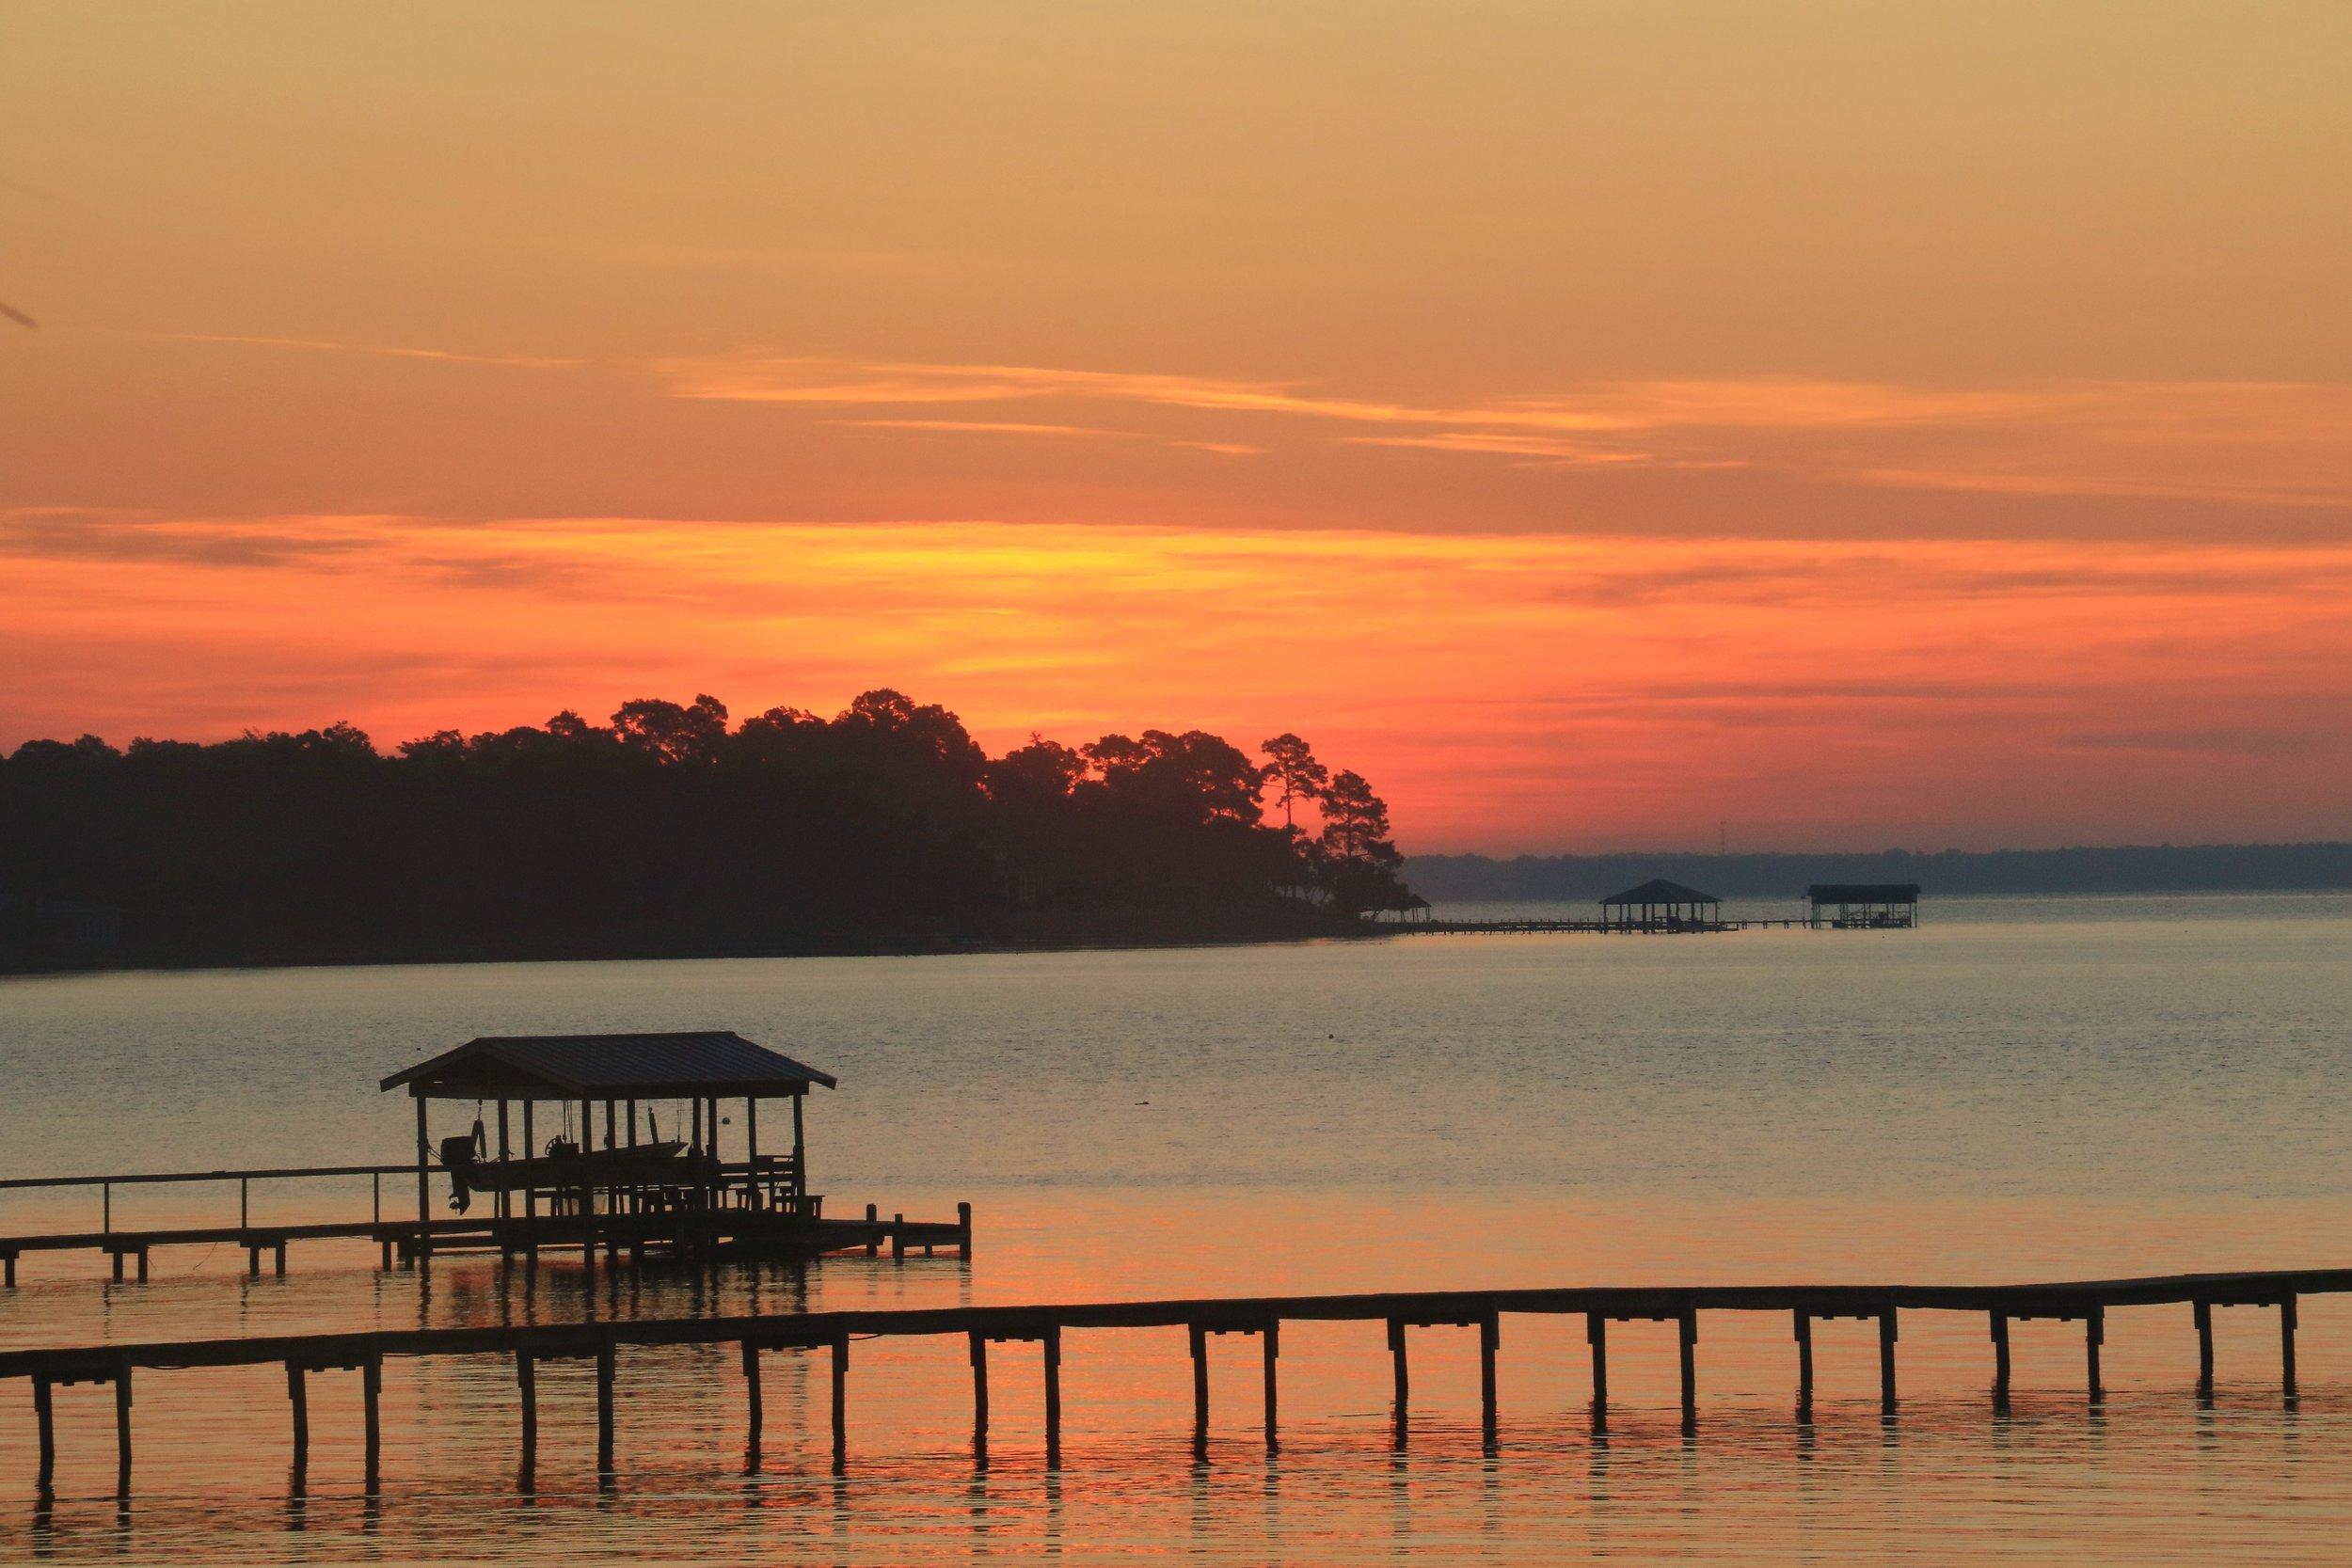 Sunrise at Perdido Bay